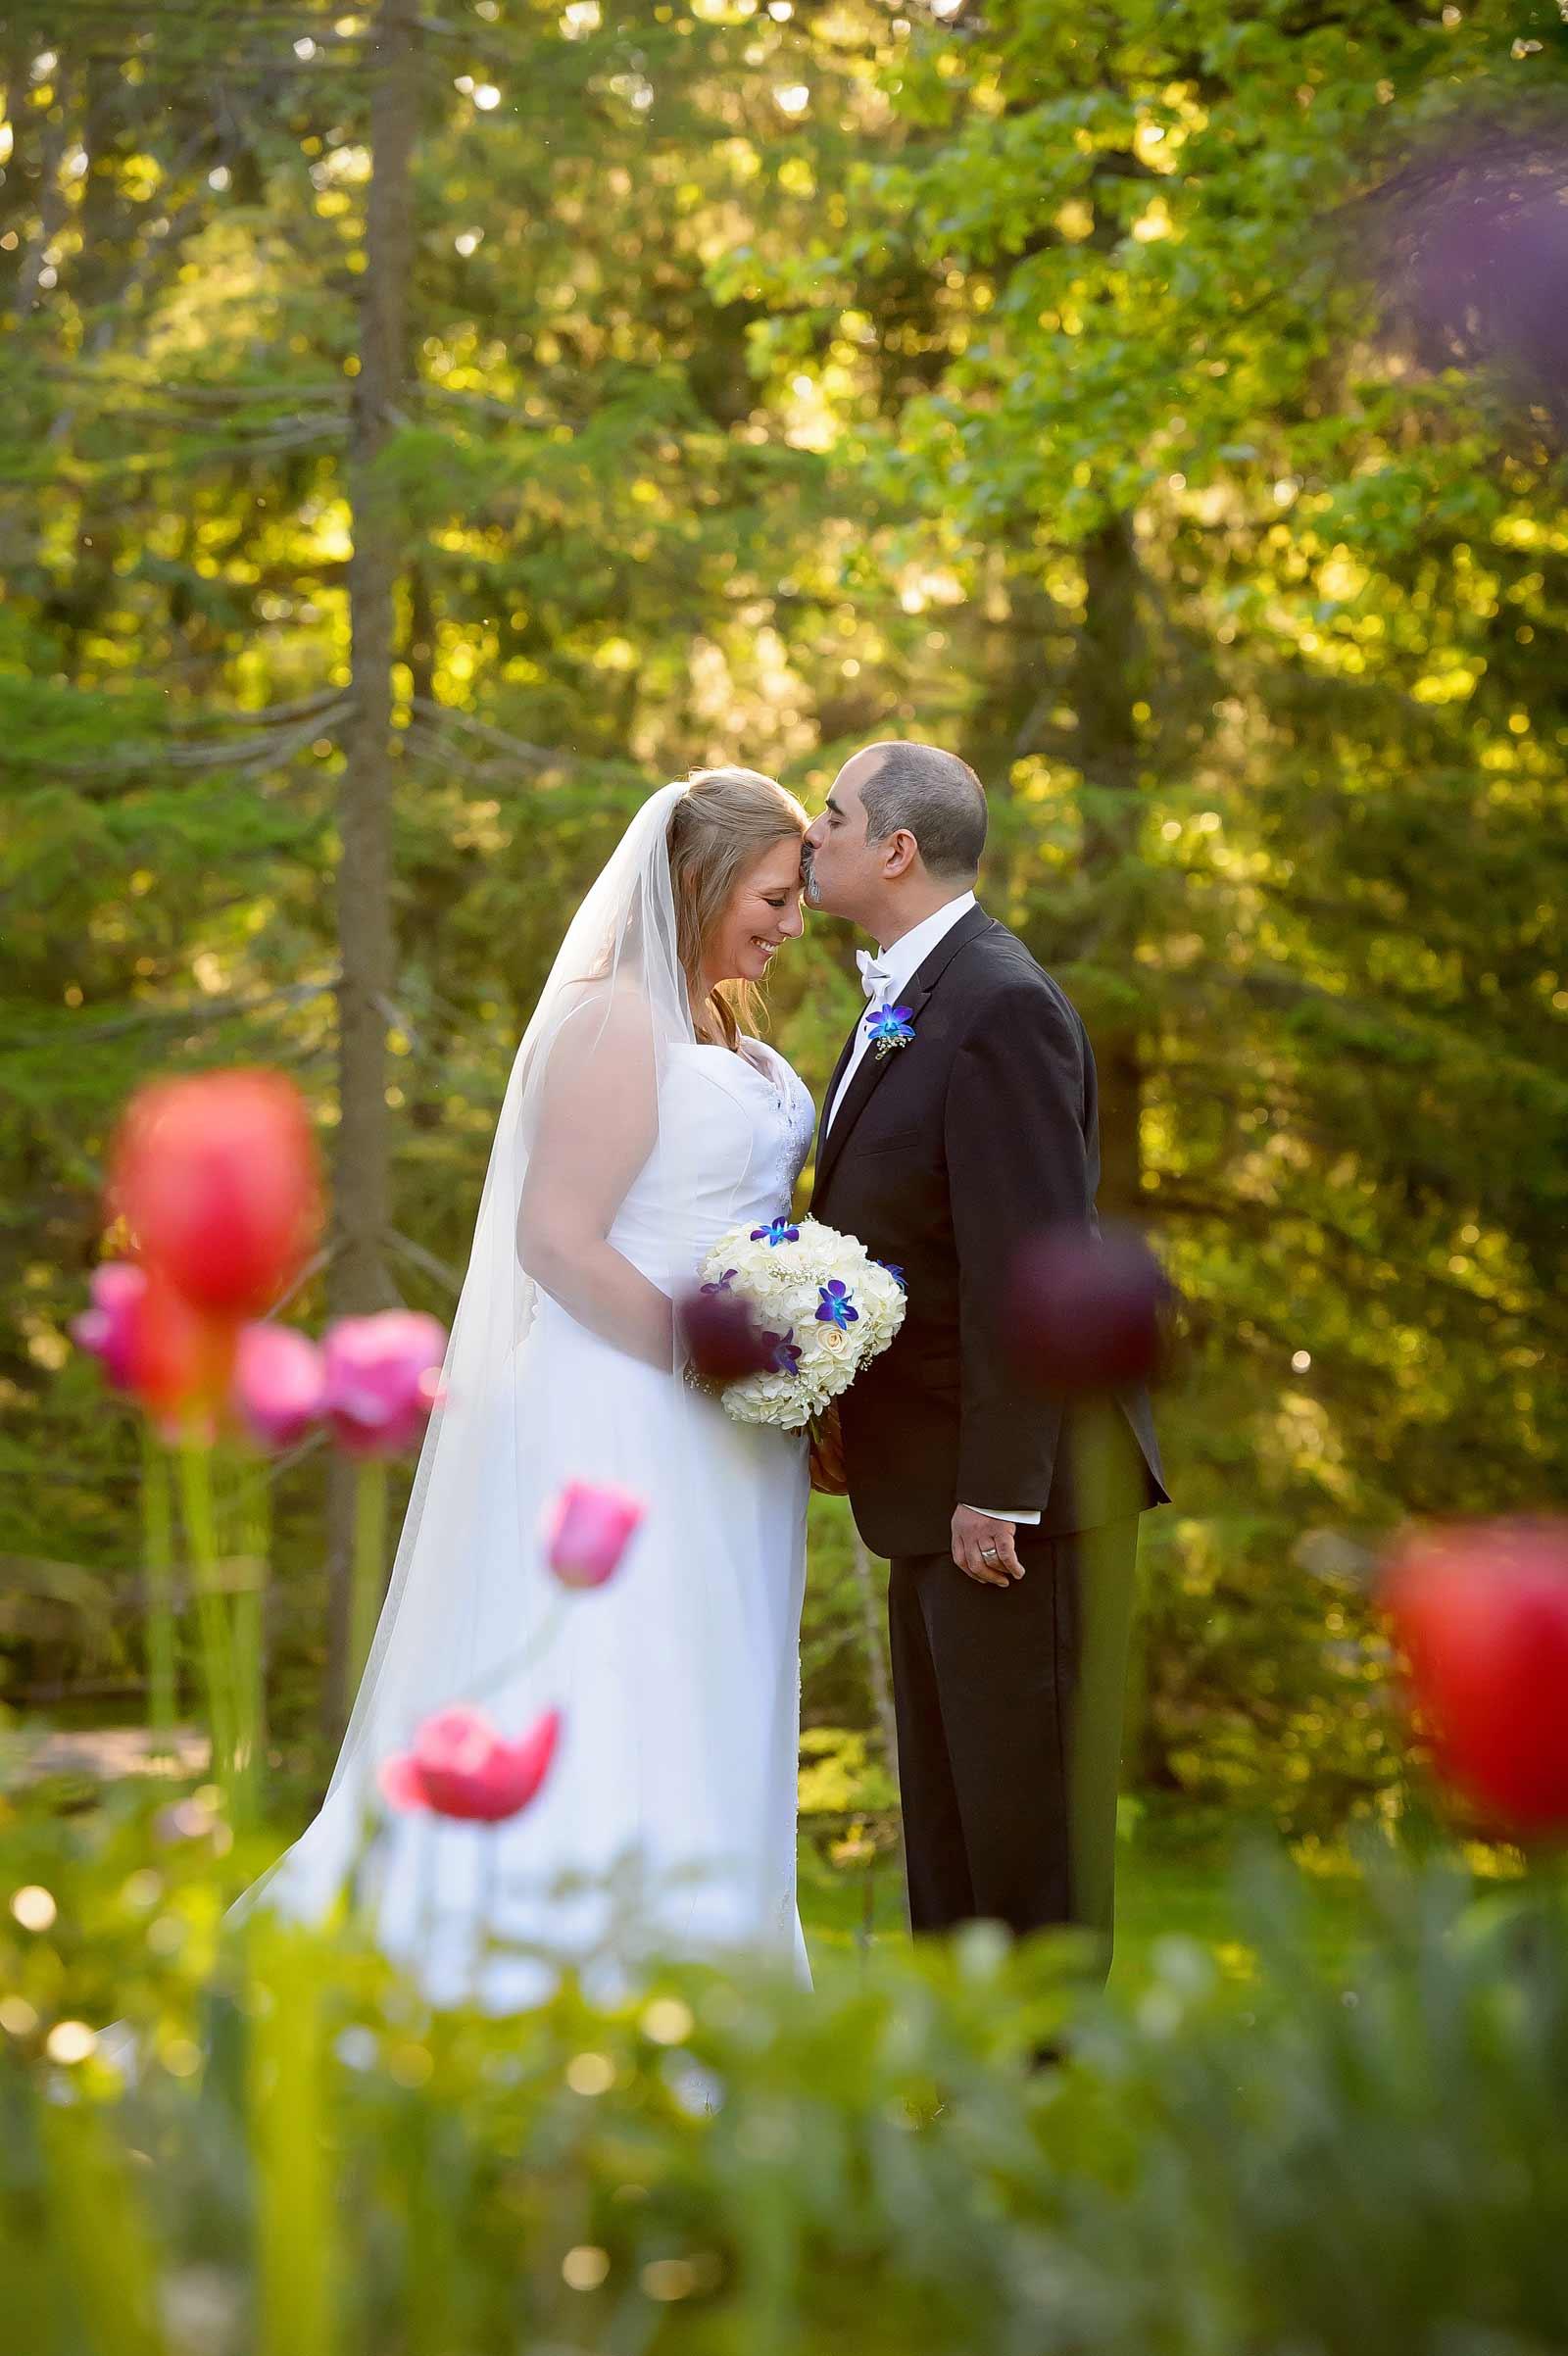 BrendaPatrick-wedding-sneakpeek-01